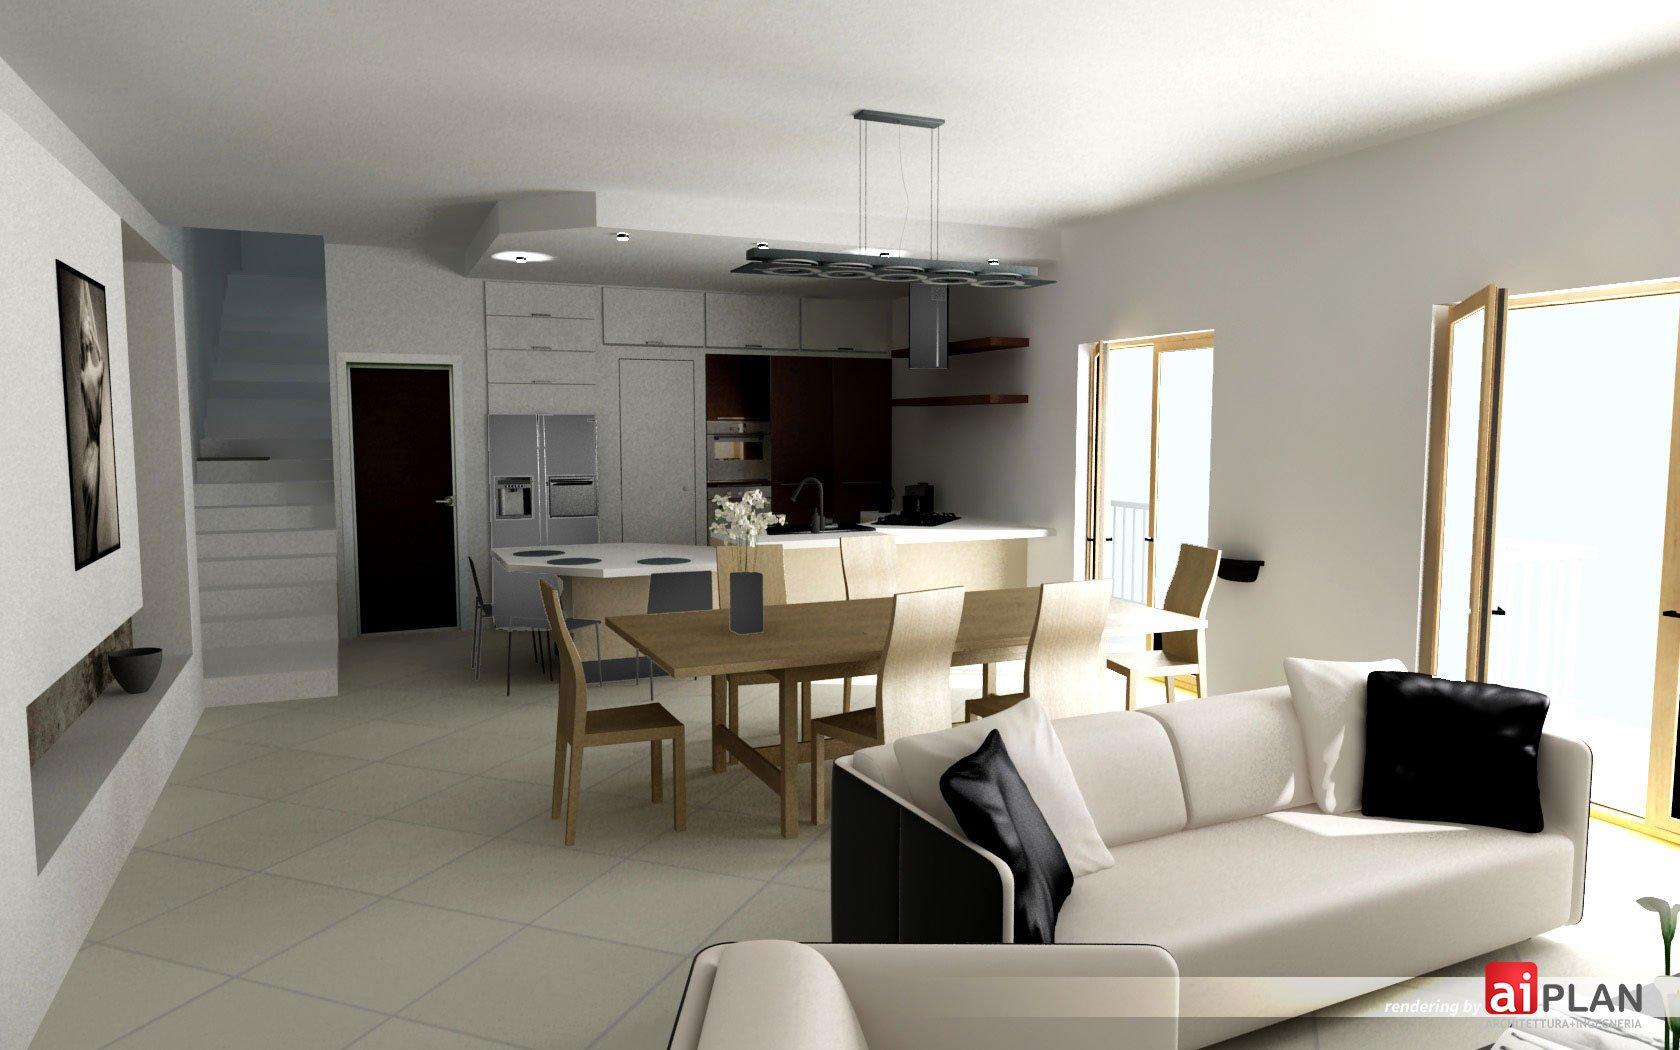 interni di residenze  Aiplan  architettura e ingegneria